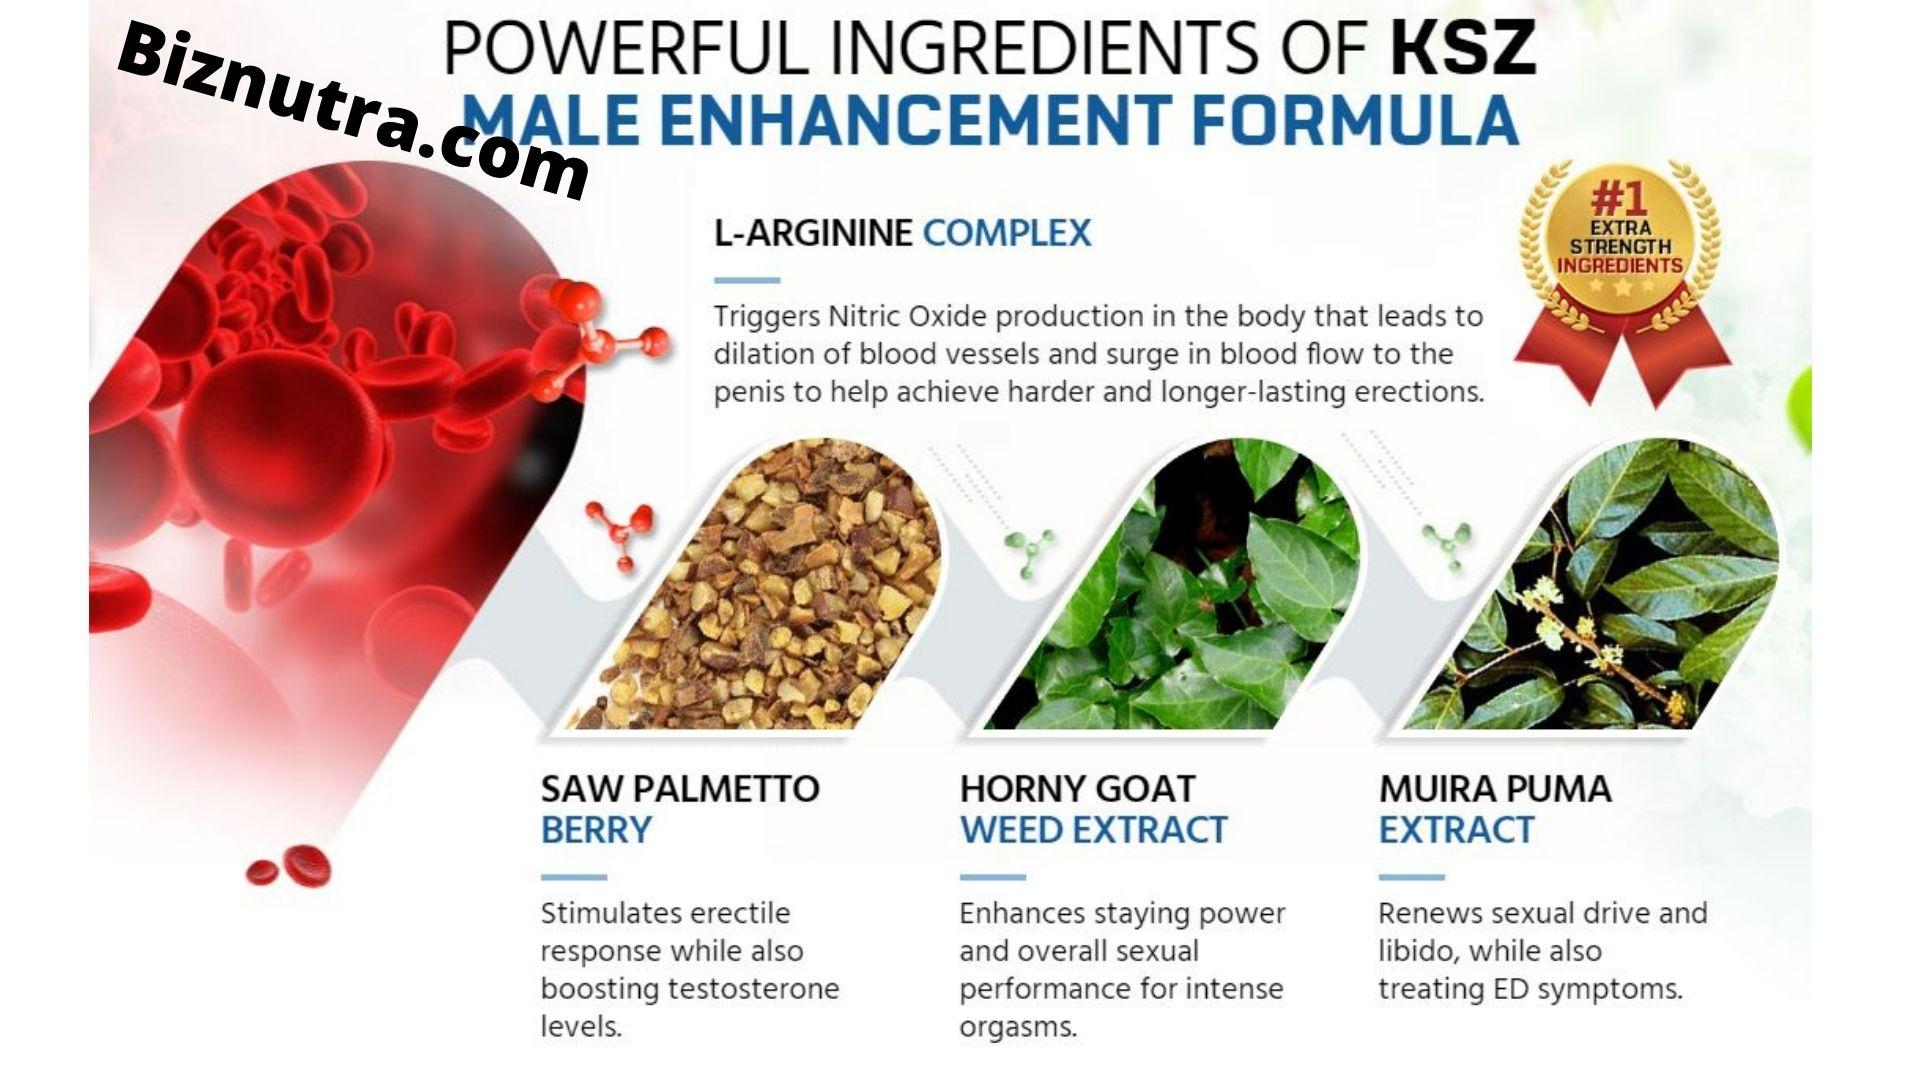 KSZ Male Enhancement #1 Supplement || Fix Your Performance Naturally!